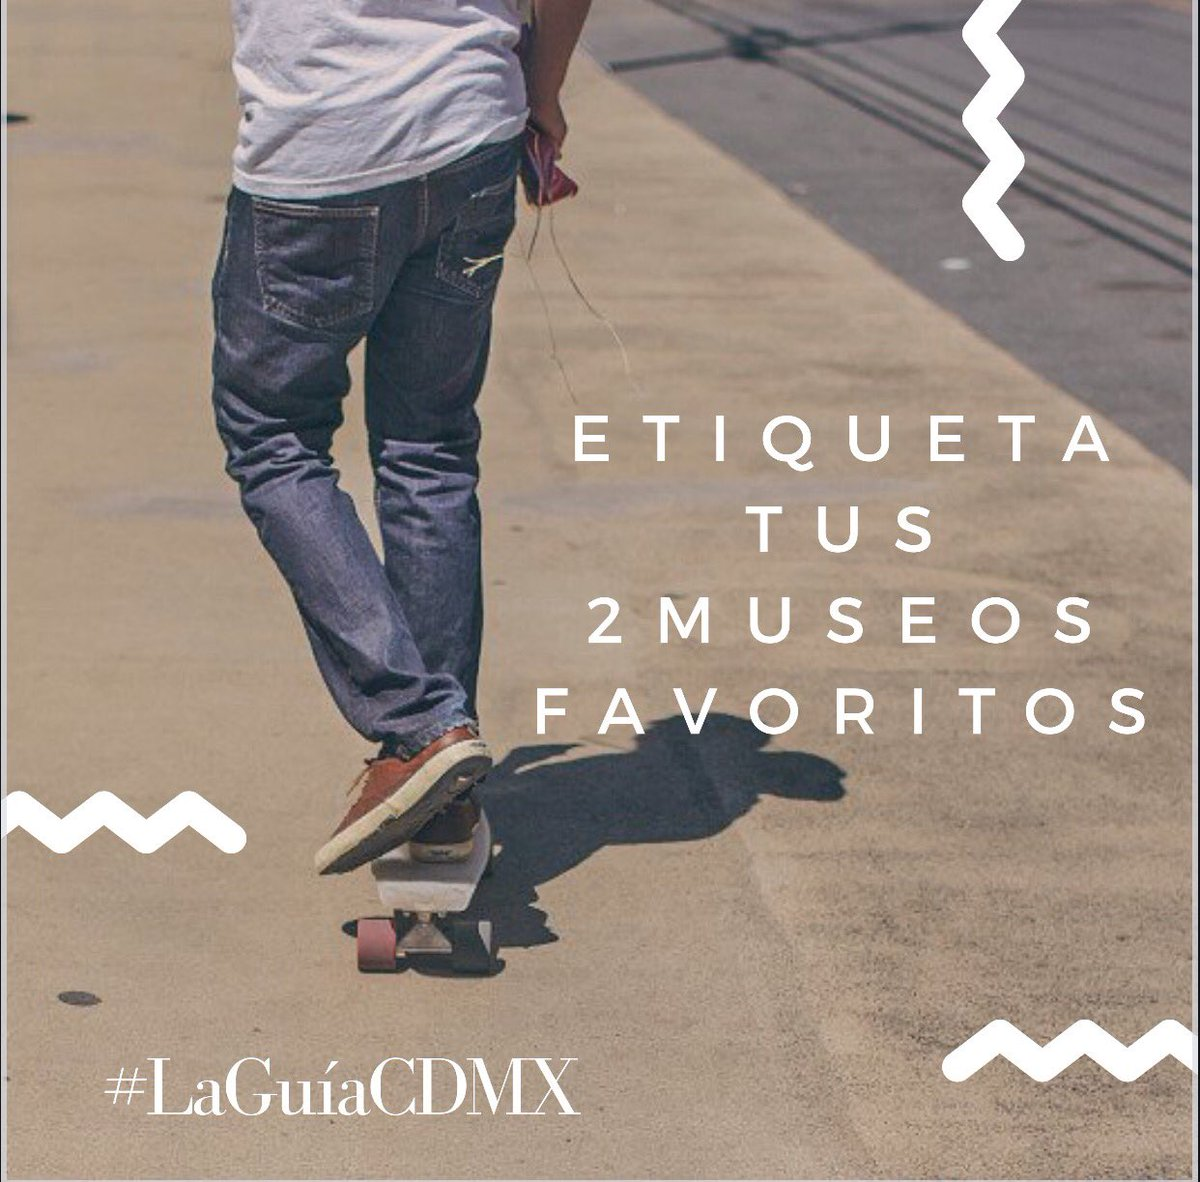 Para este reto etiquetamos a @umarista  @nanocromias nuestros museos favoritos son: @museofridakahlo @museoAmodernoMX #LaGuíaCDMX https://t.co/vL2JvbDbvQ